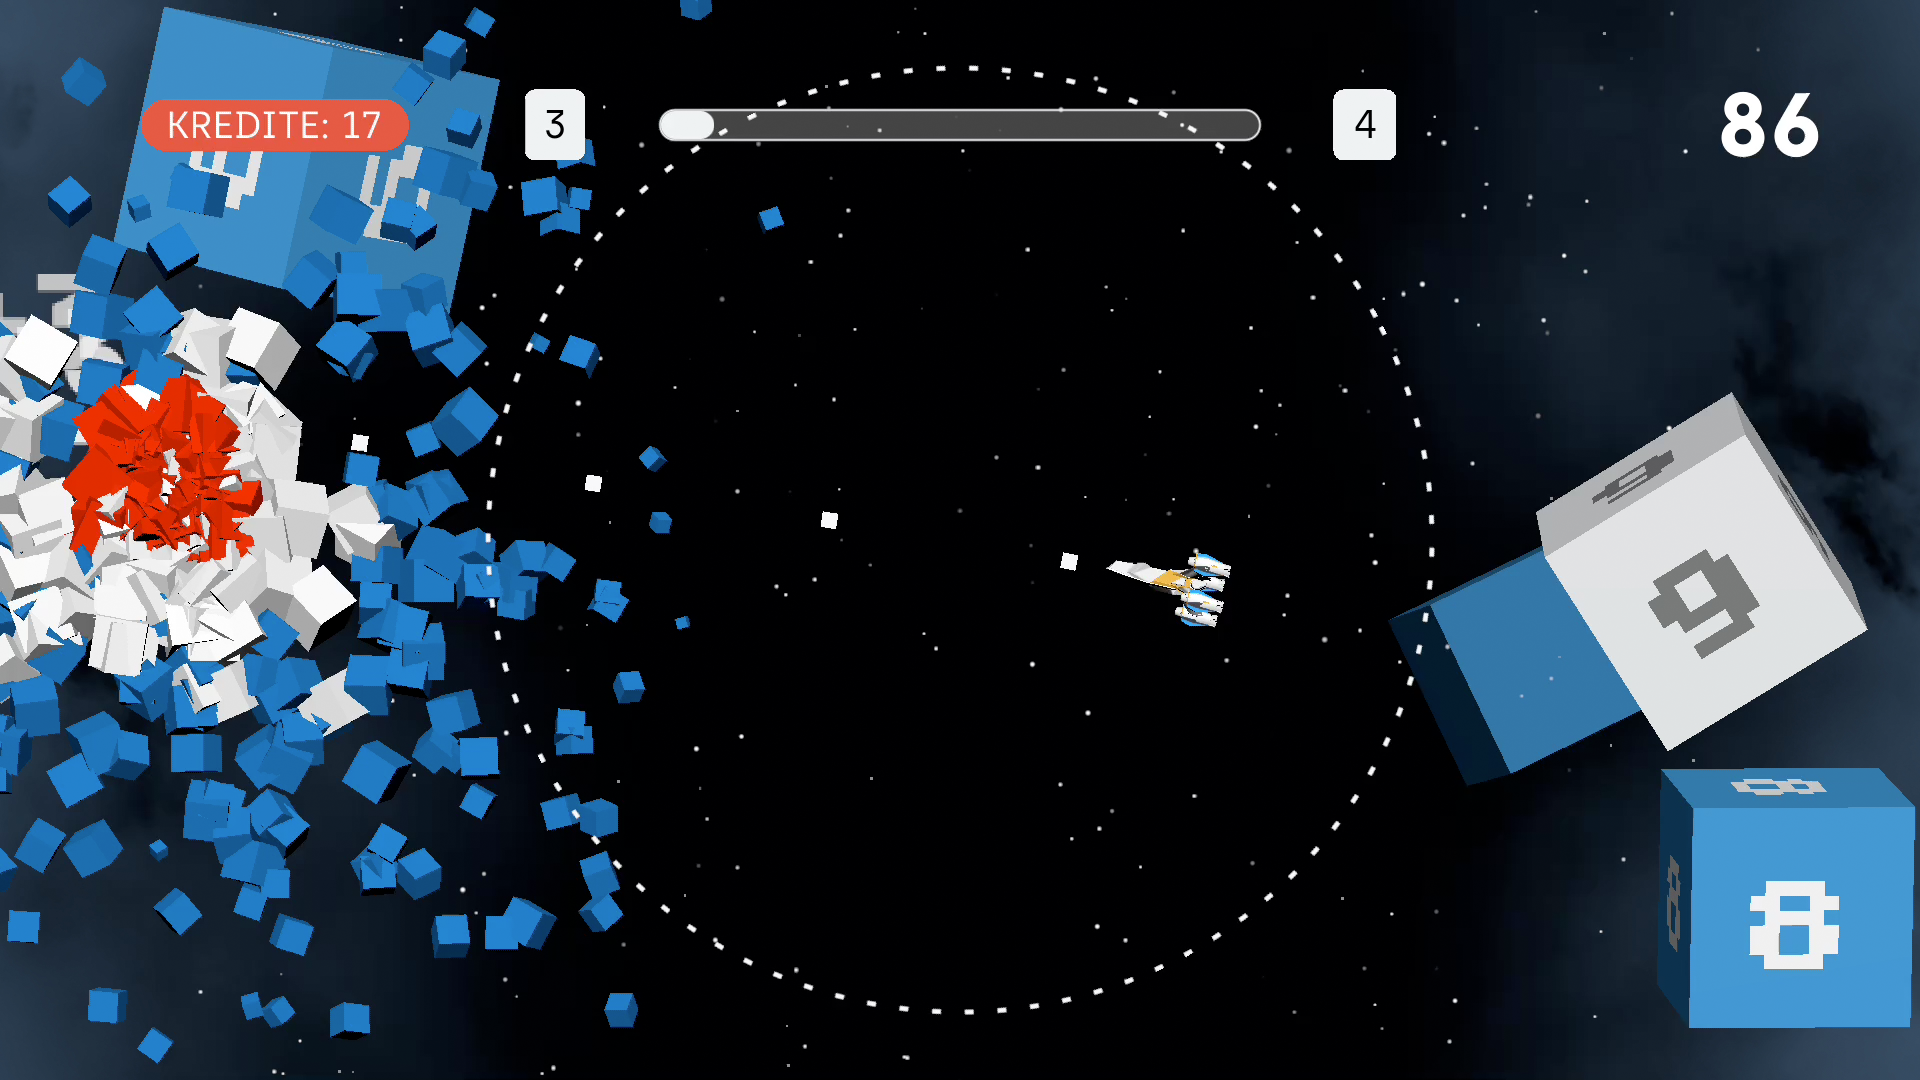 Screenshot 22 of 29